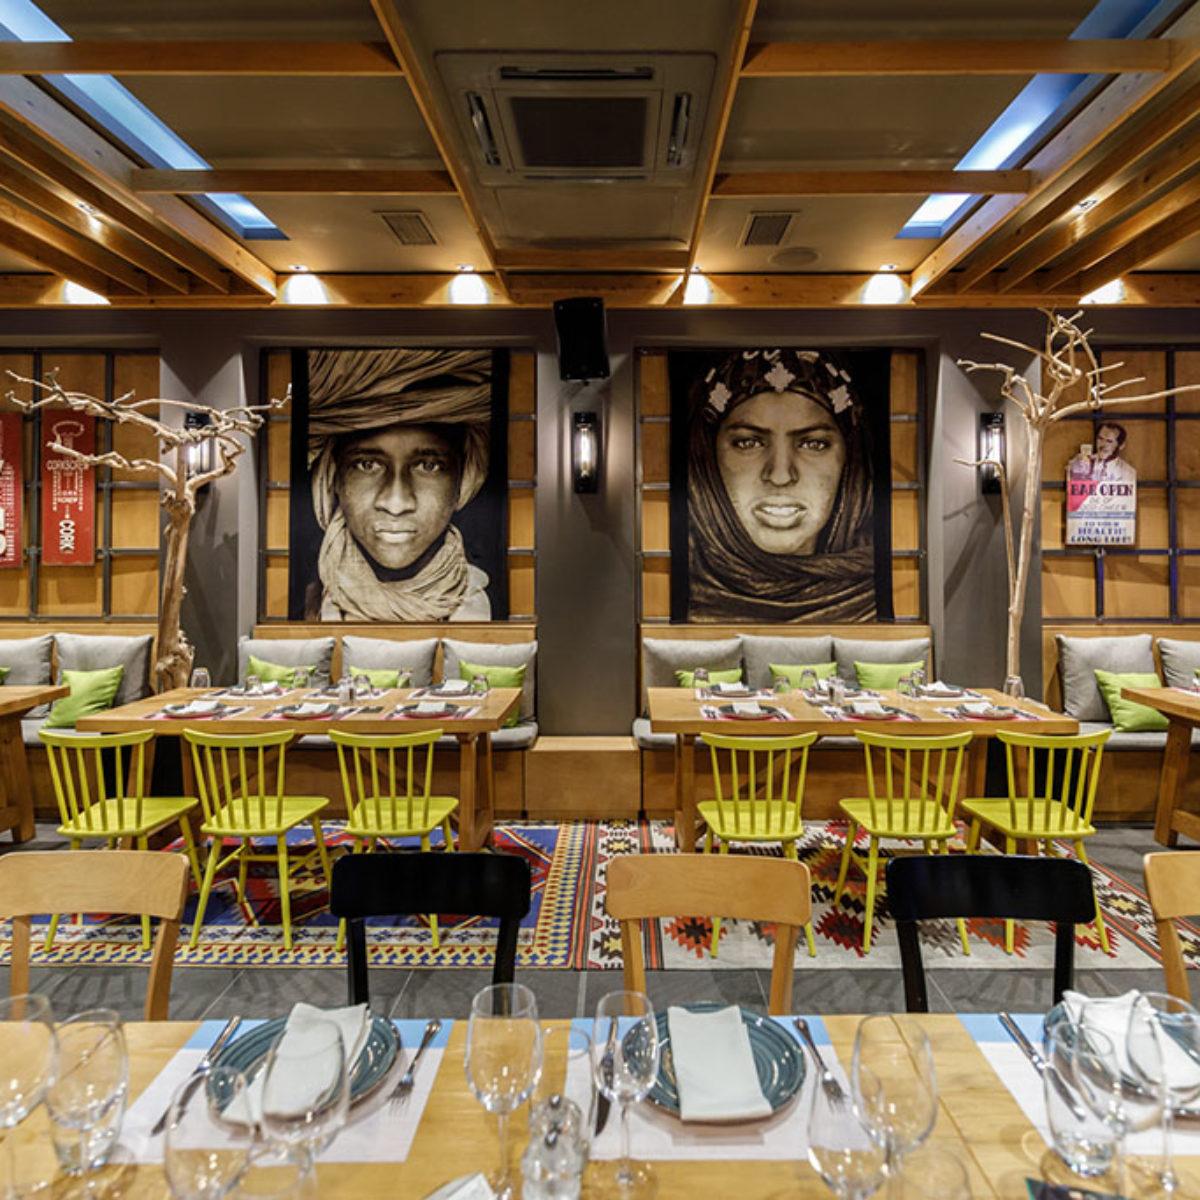 Yiamas Gastro Bar - Restaurant Καλαμάτα - Μοντέρνα Ευρωπαϊκή Κουζίνα menu - Χώρος 4